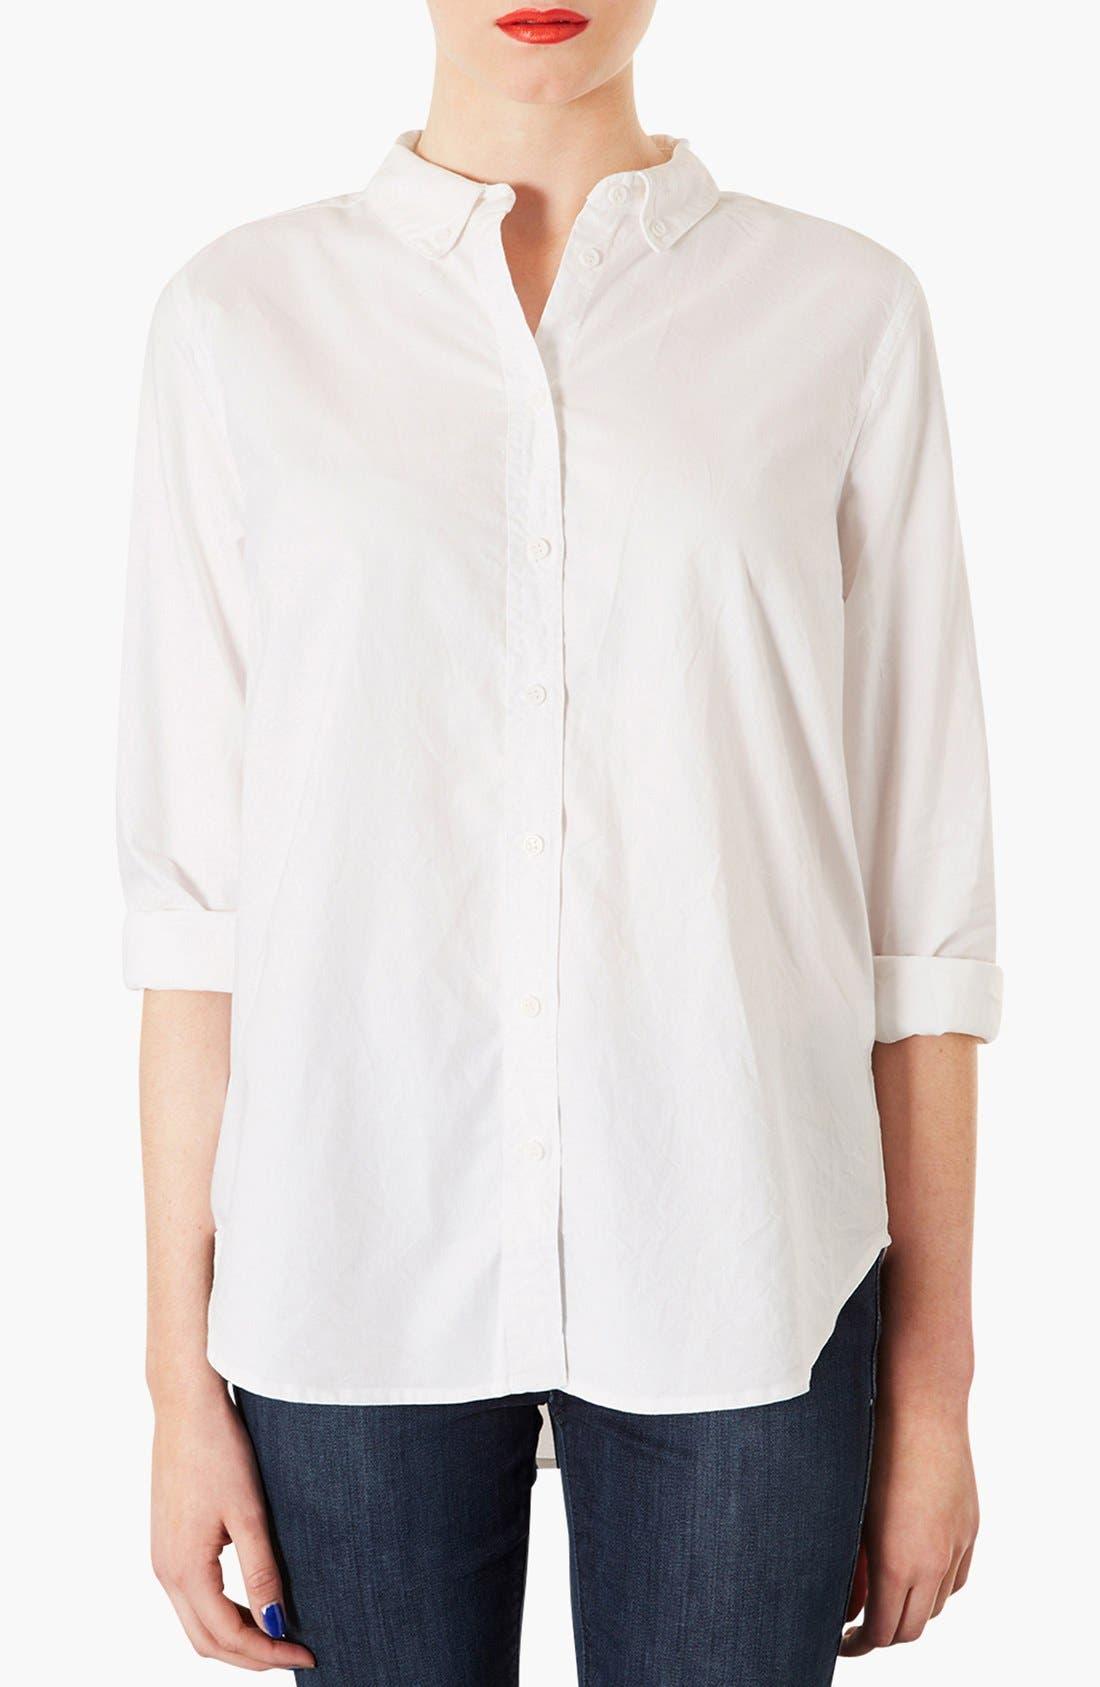 TOPSHOP Woven Oxford Shirt, Main, color, 100